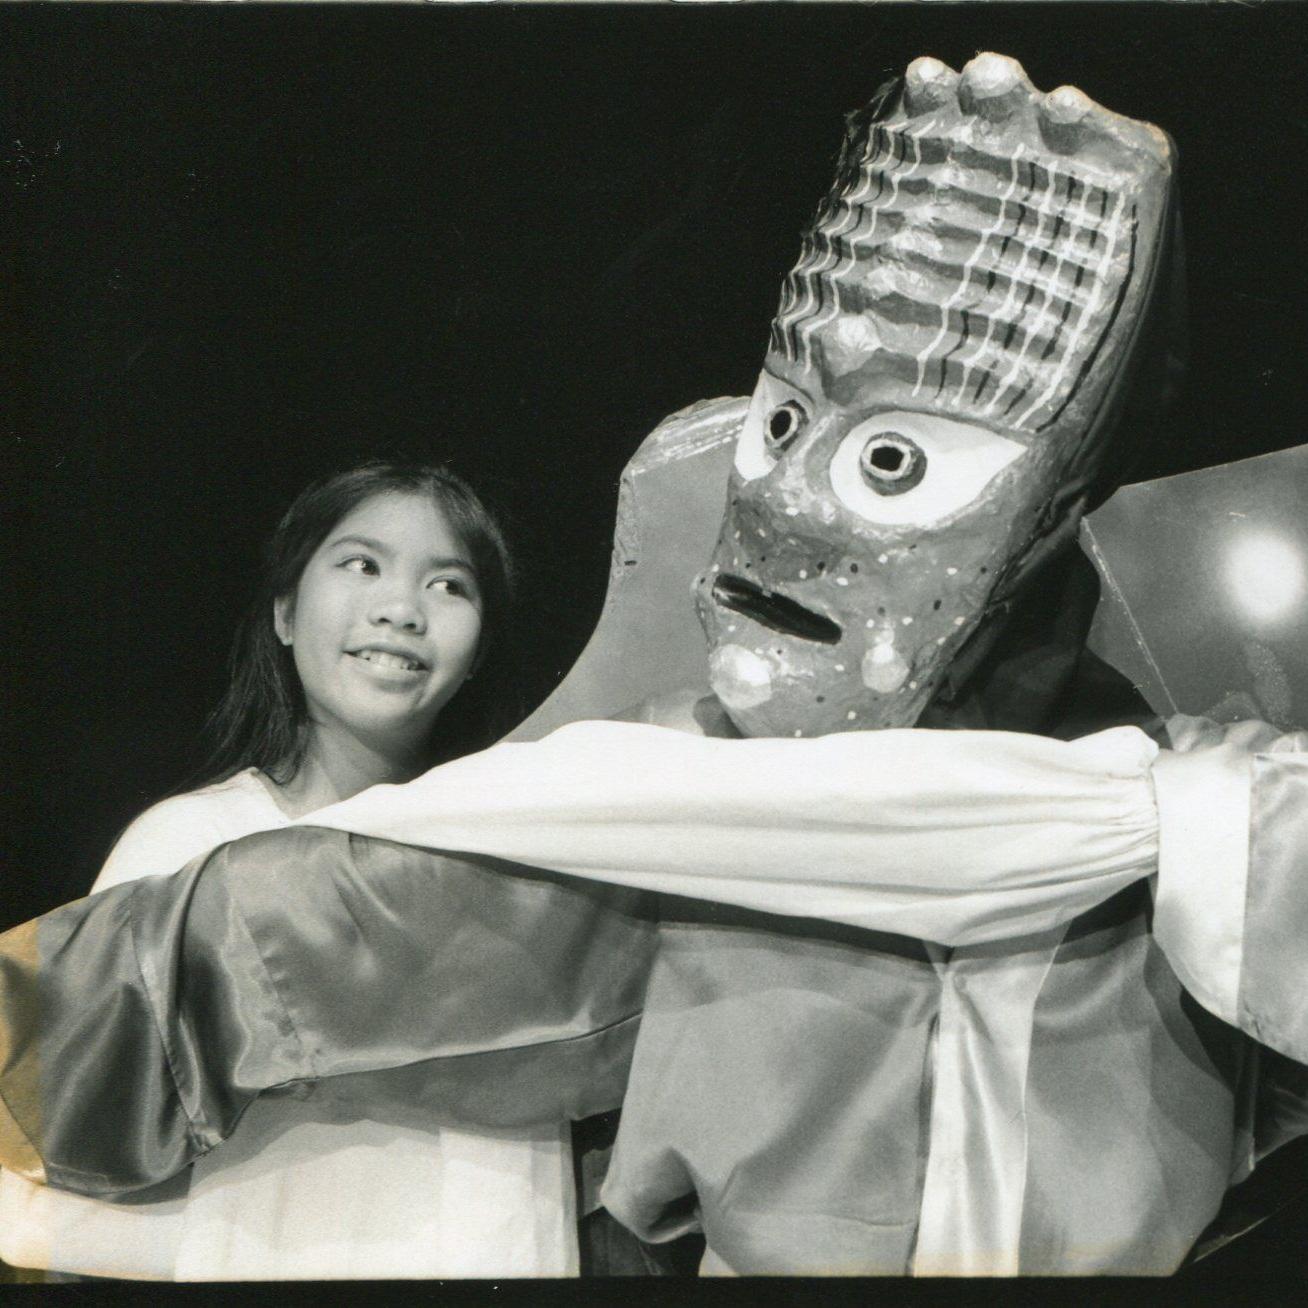 WALLEYE KID - by R.A. SHIOMI & SUNDRAYA KASE directed by RICK SHIOMIOctober 15 - November 1, 1998